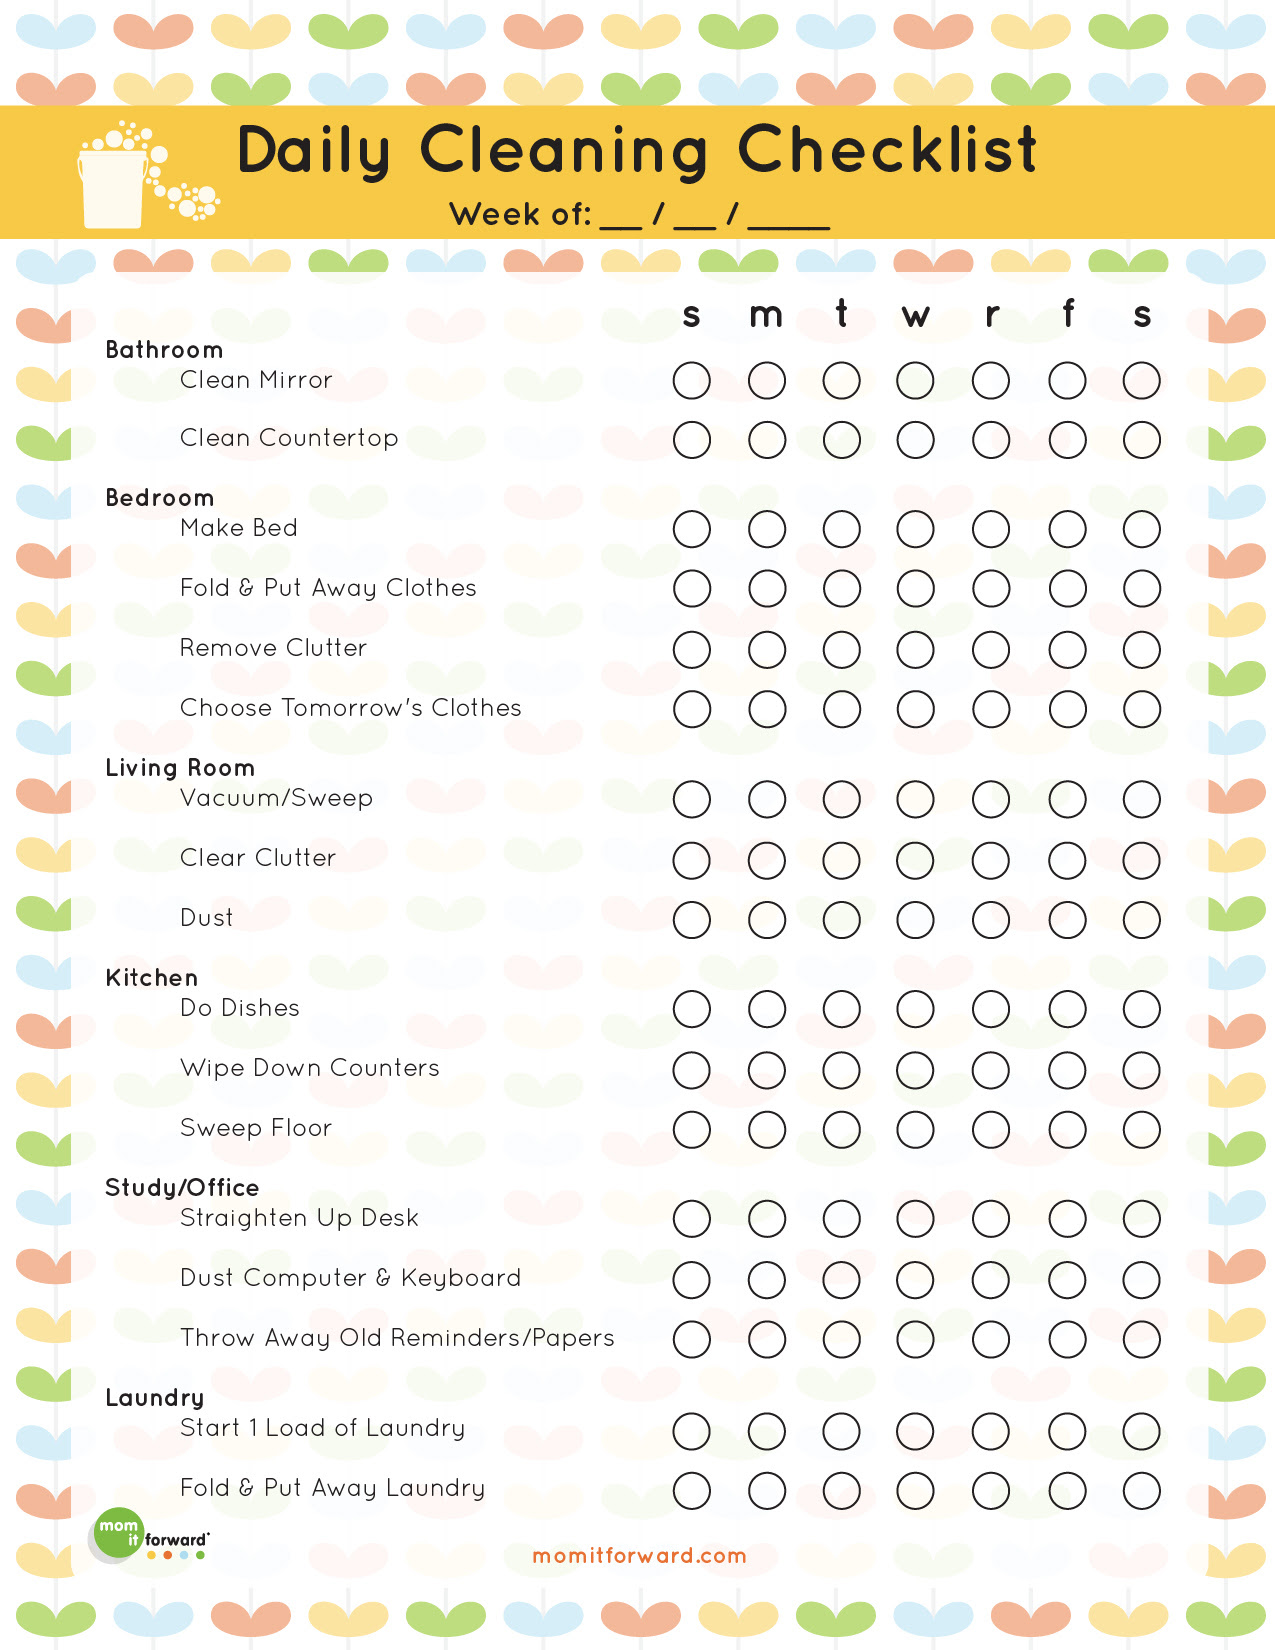 Daily Cleaning Checklist Printable - Mom it ForwardMom it Forward